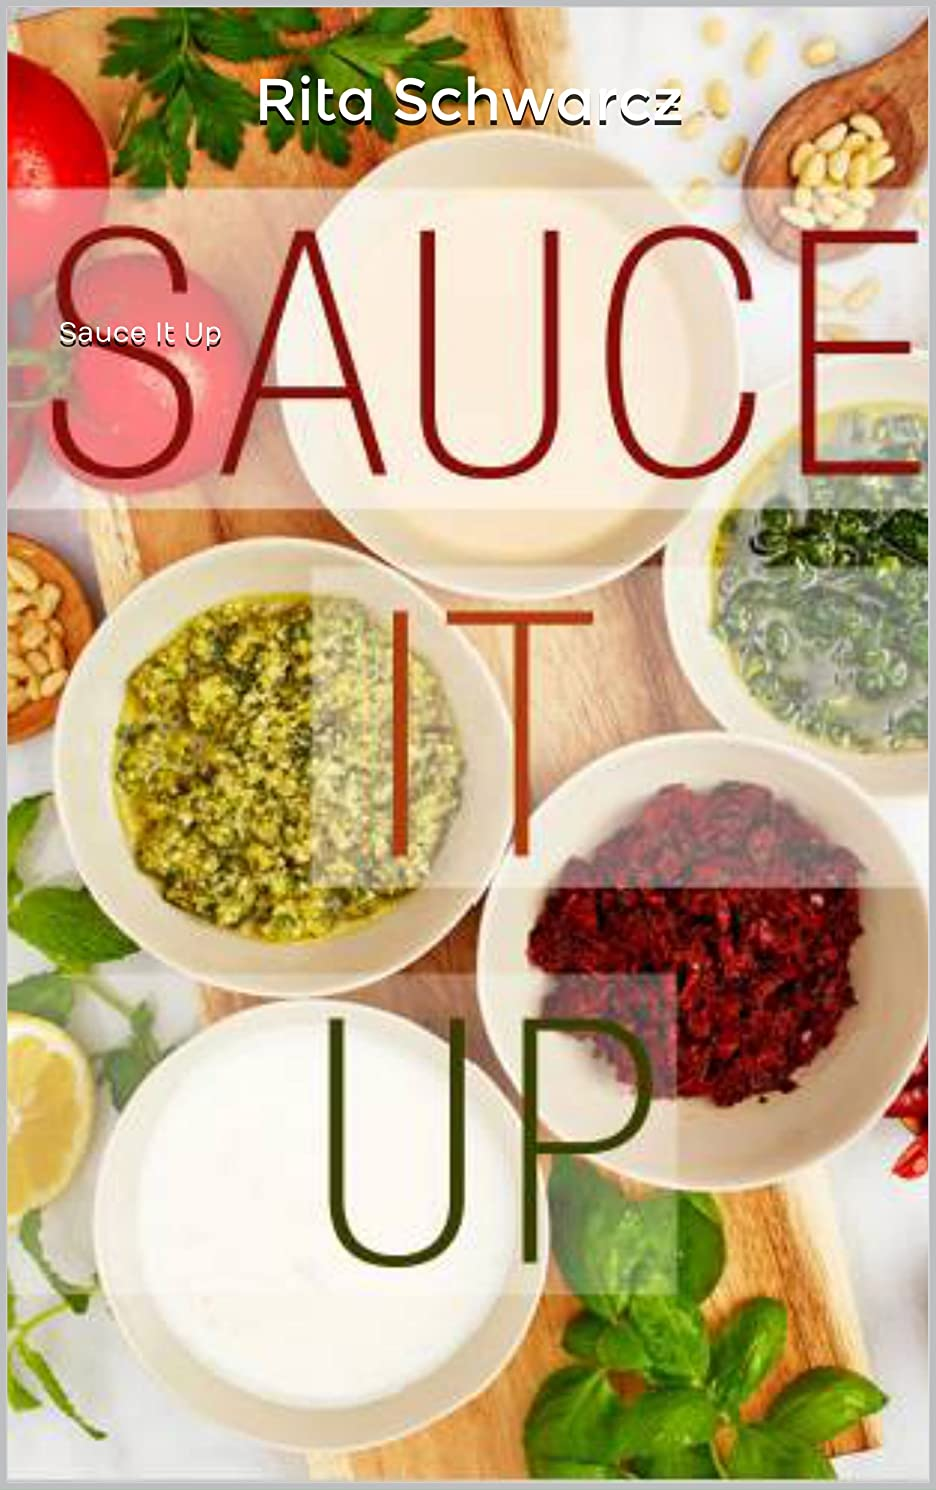 Sauce It Up (English Edition)